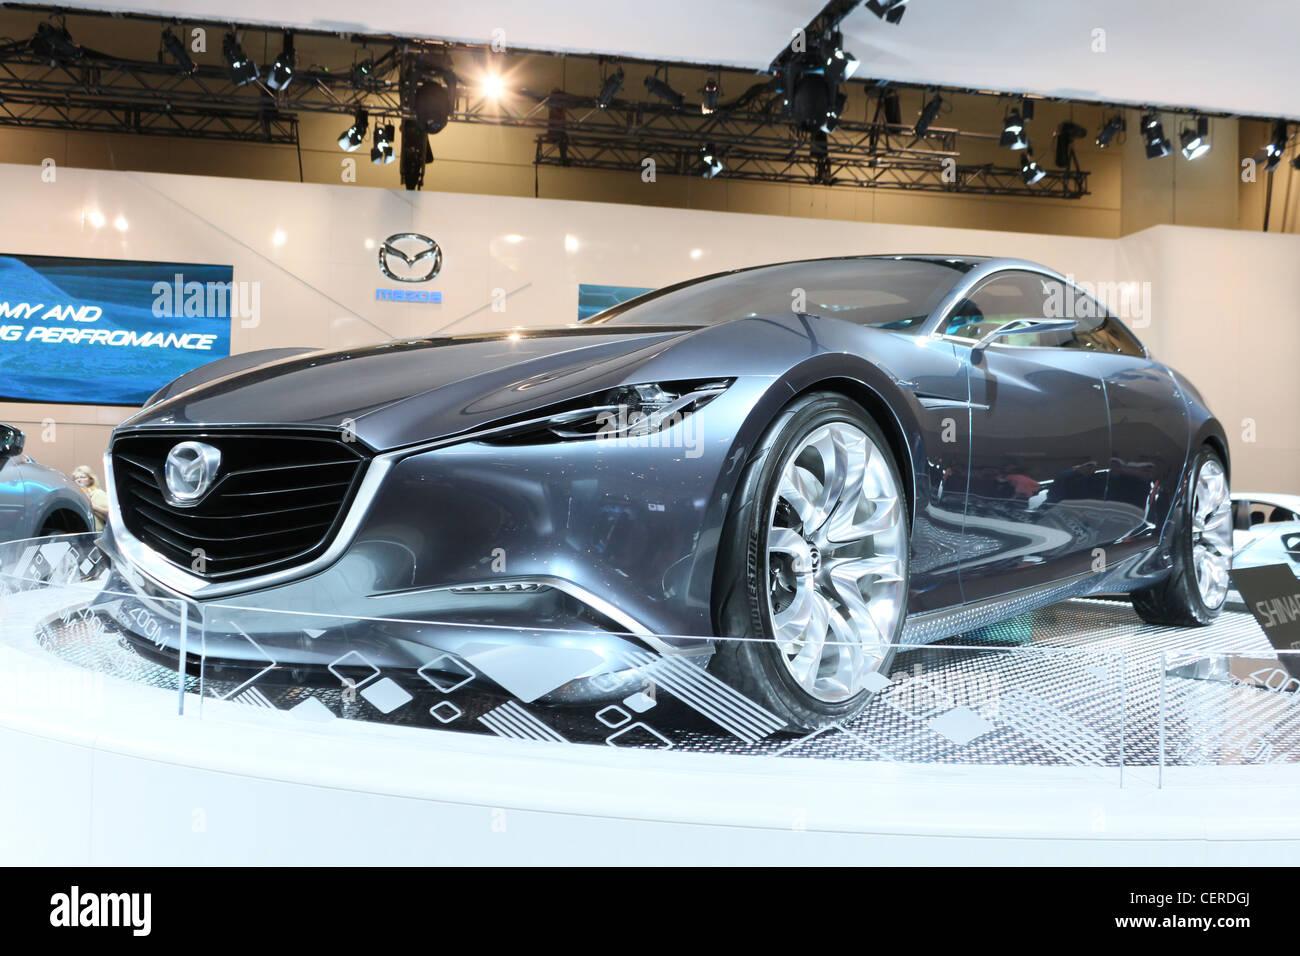 Kelebihan Kekurangan Mazda Shinari Murah Berkualitas